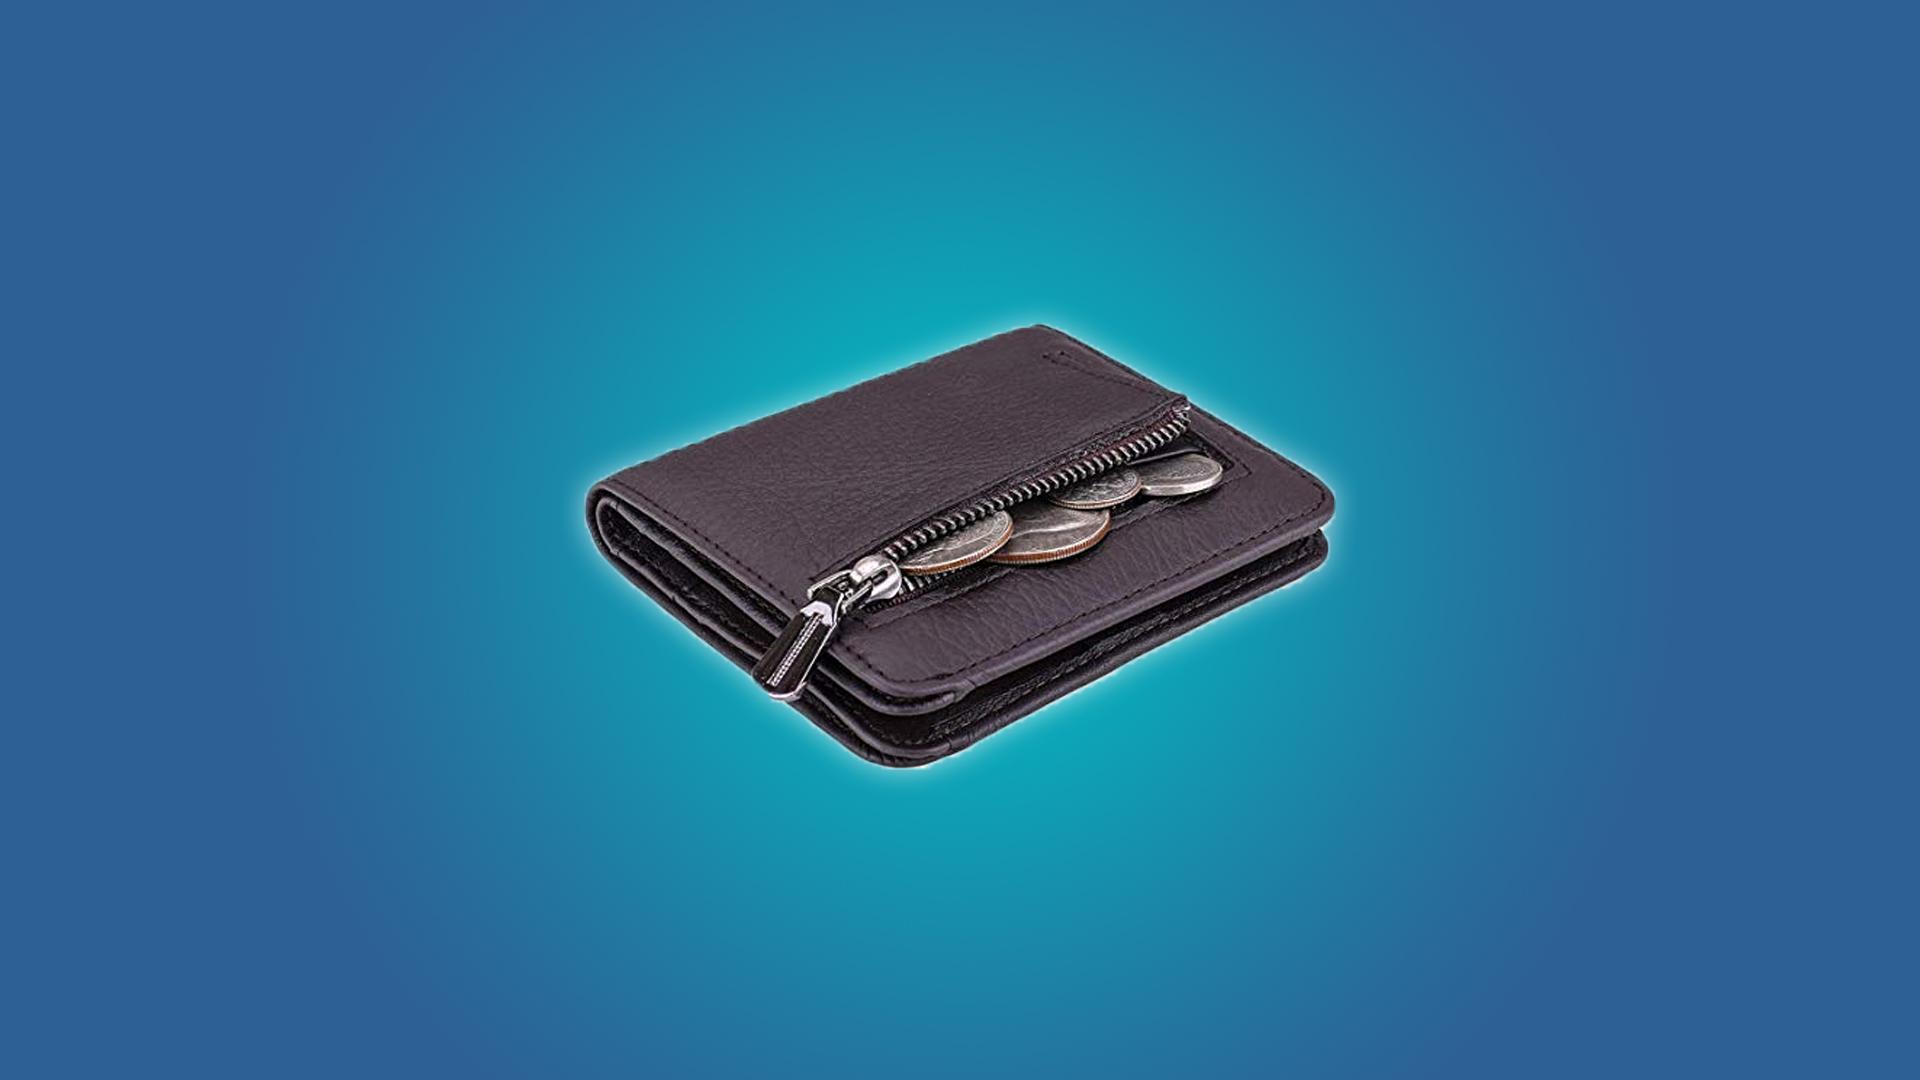 Itslife Compact RFID-Blocking Wallet